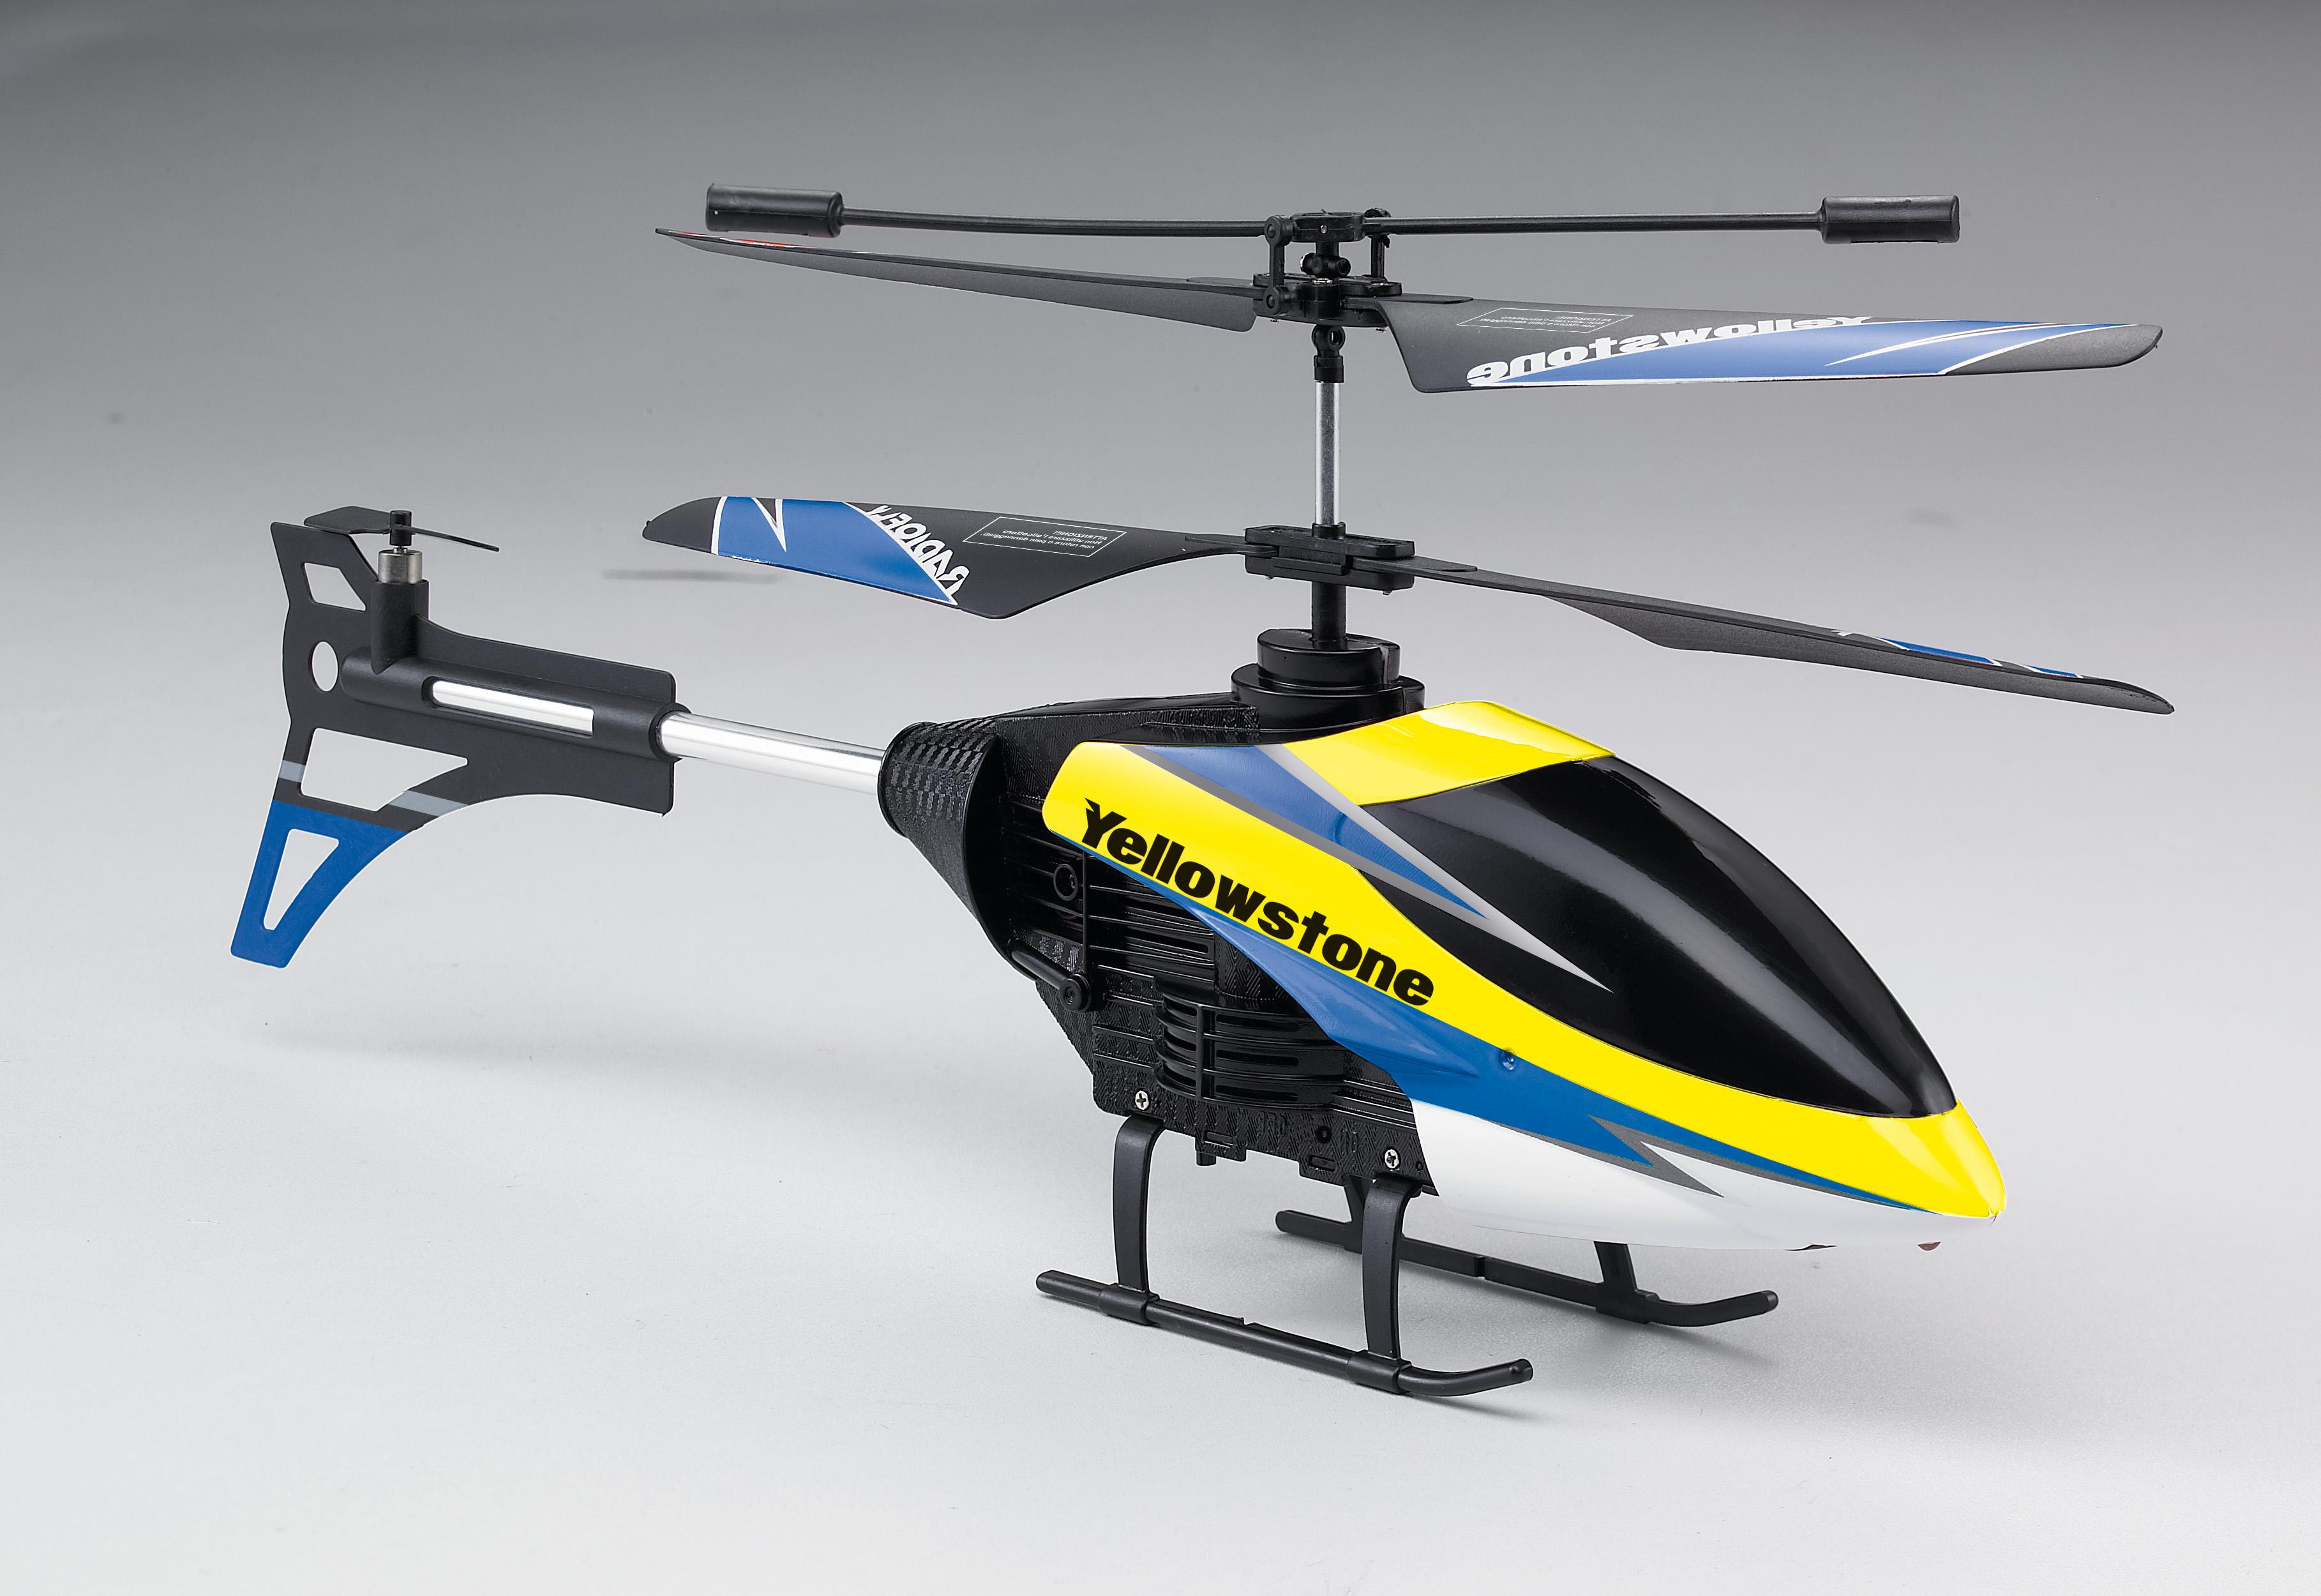 Elicottero Radiofly : Radiofly ods distribuzione